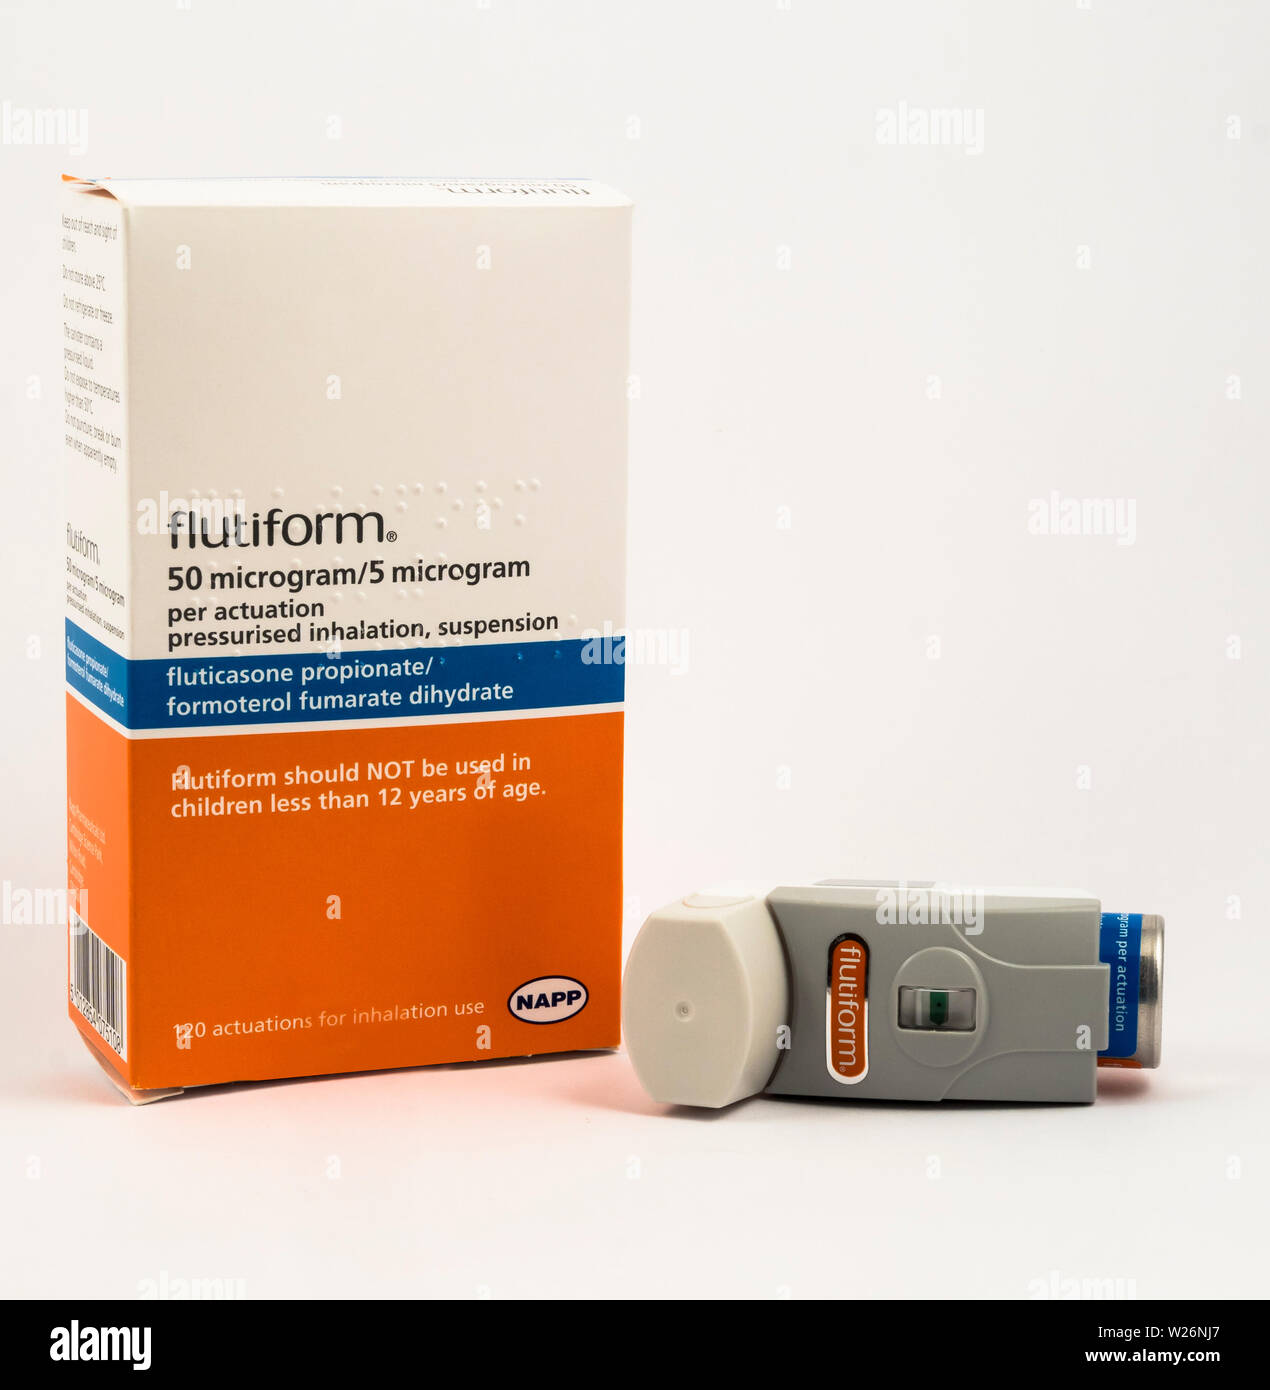 Flutiform pressurised inhalation, suspension Stock Photo